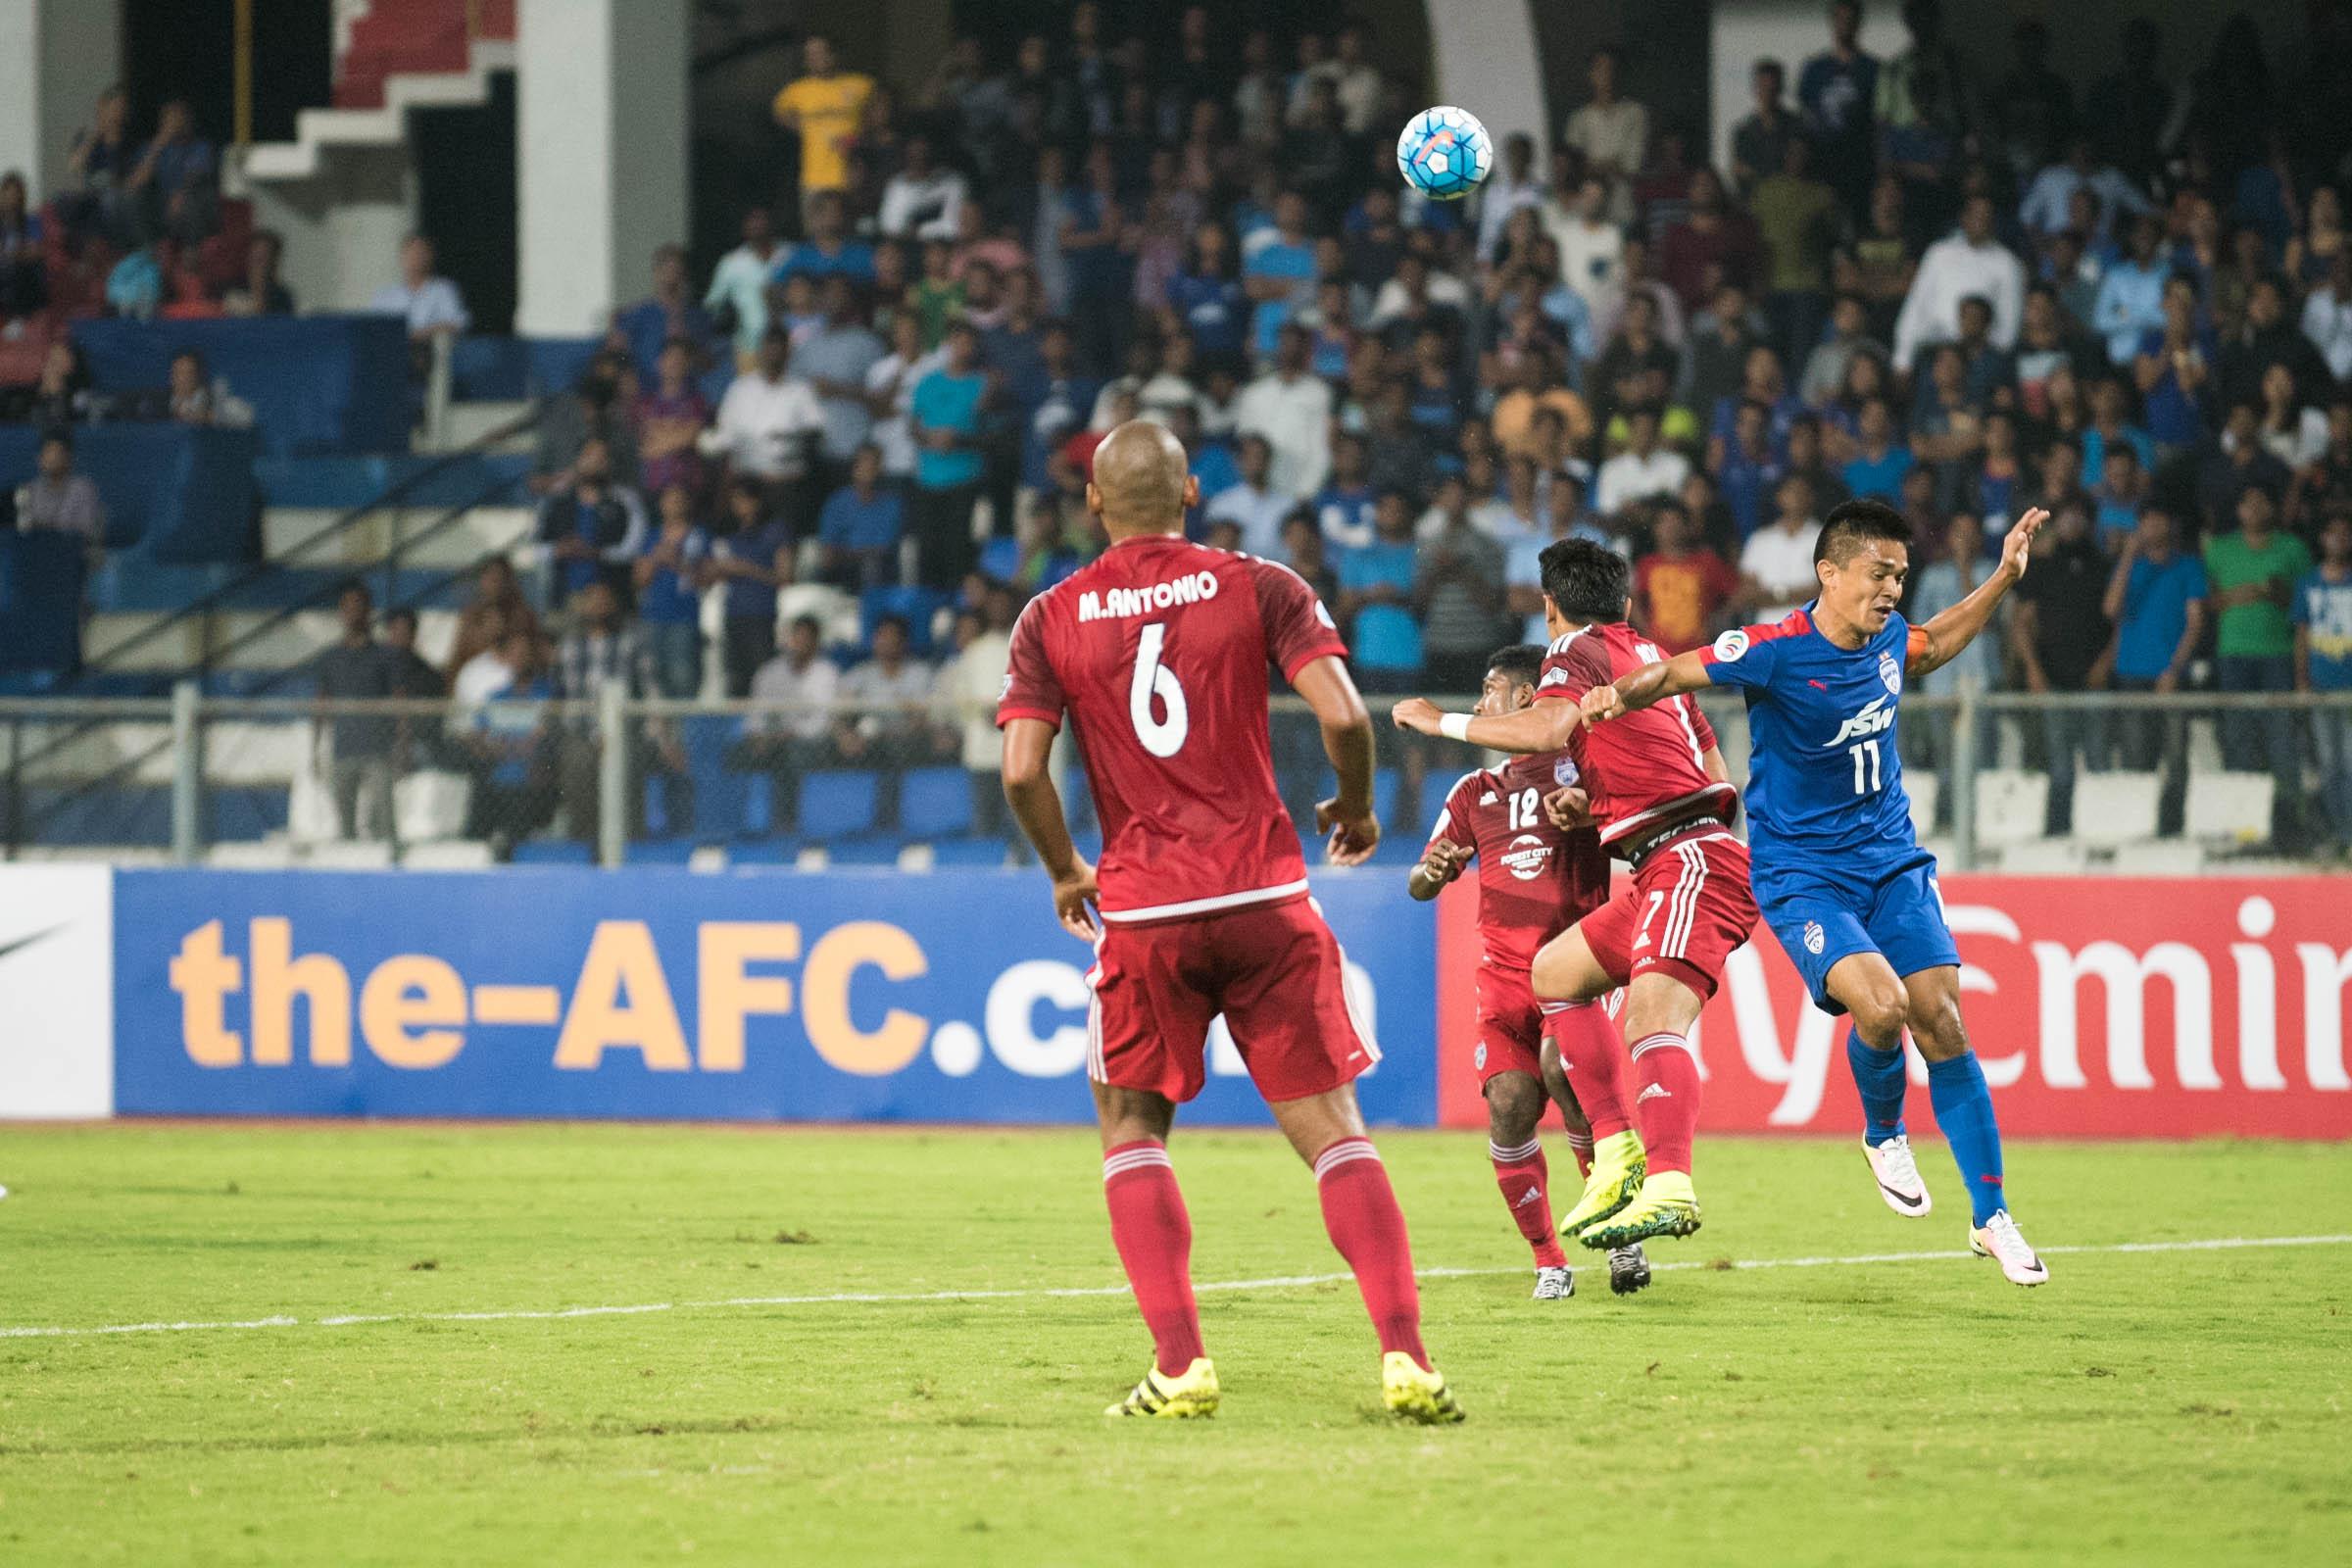 Analisis Taktikal Piala AFC: Bengaluru Pasukan Yang Lebih Baik Secara Taktikal  ...